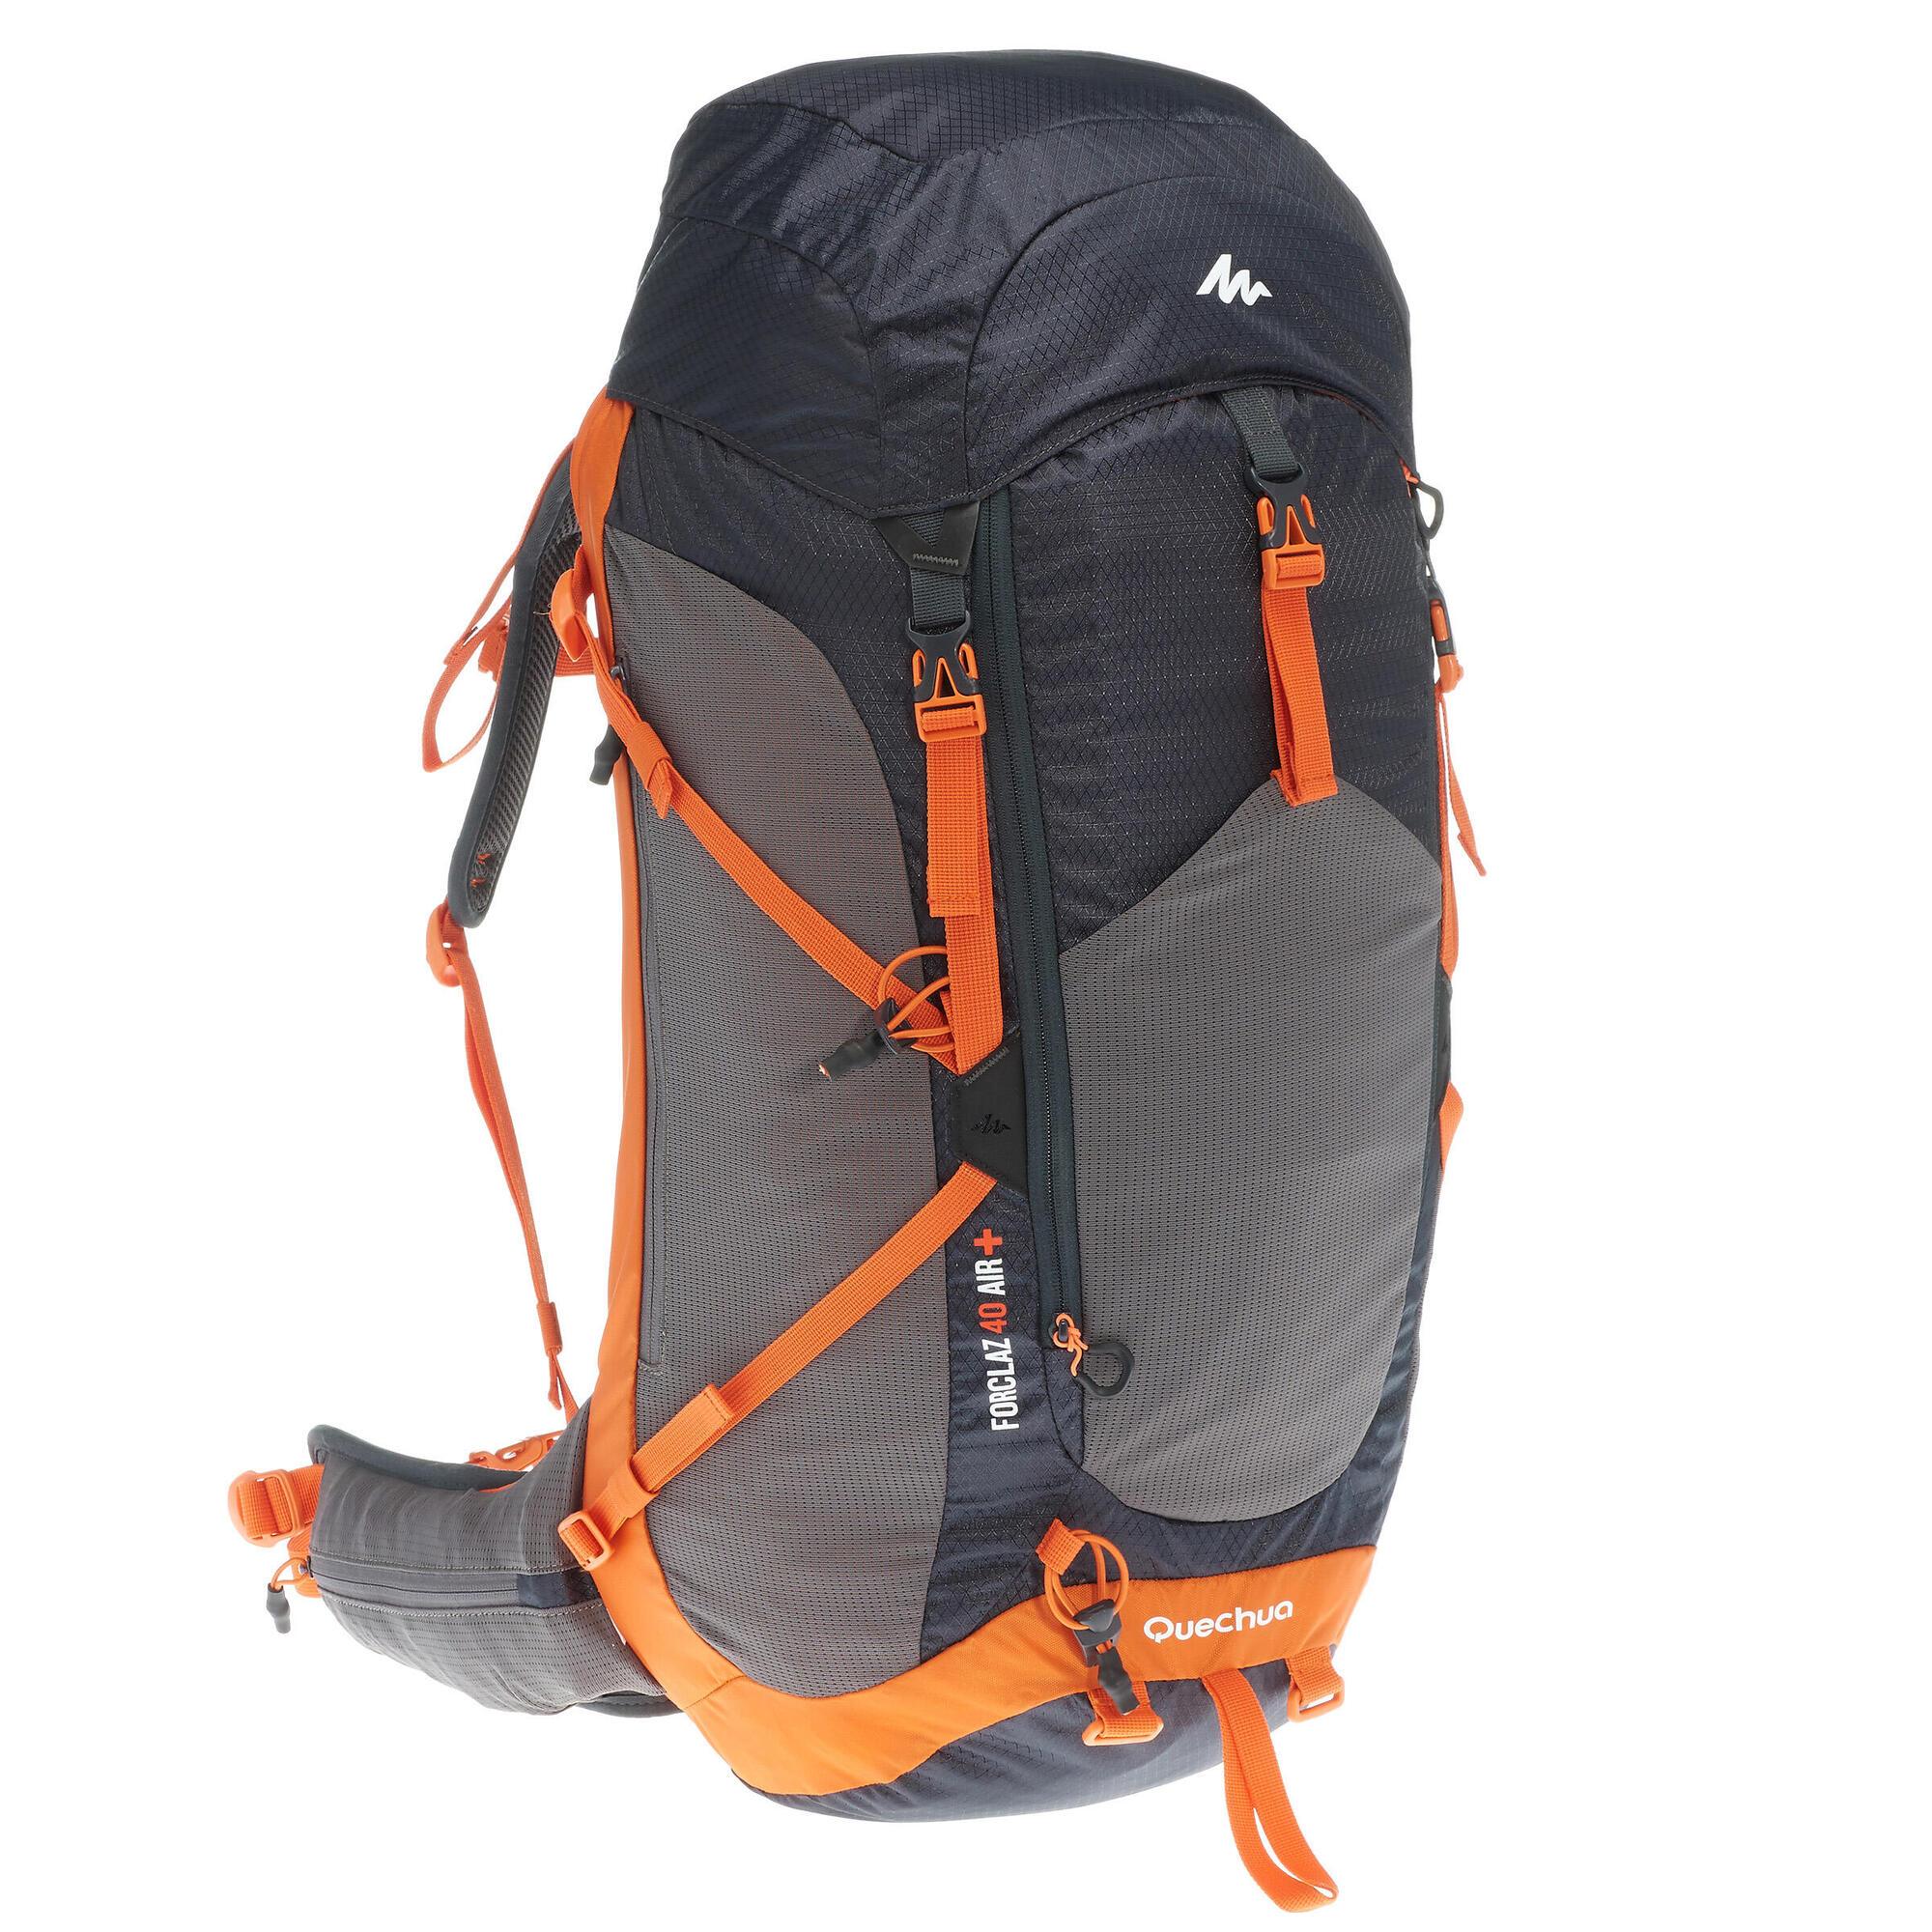 Forclaz 40 Litre Air Backpack